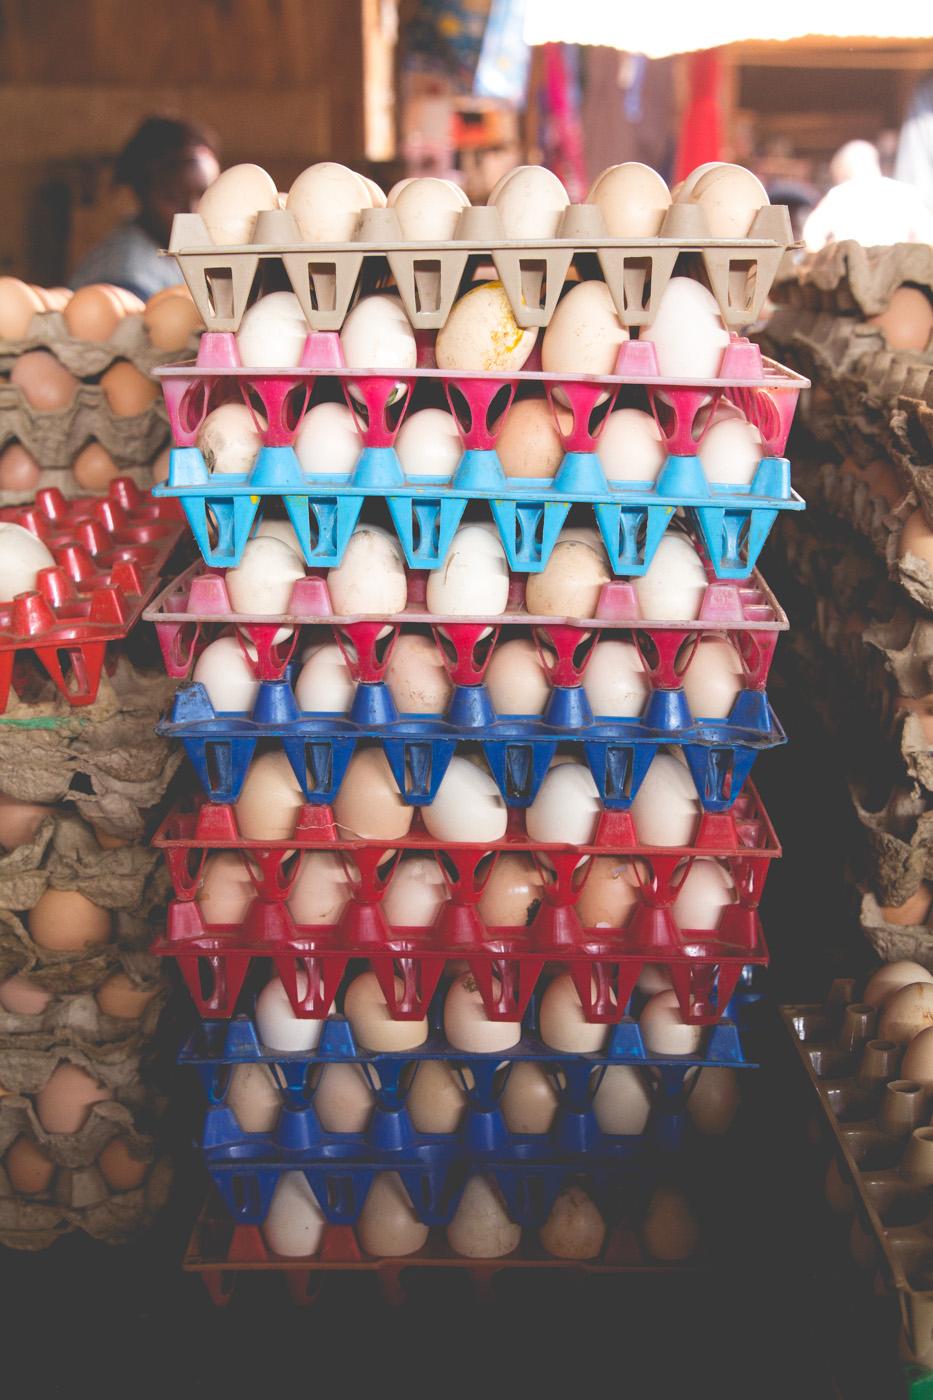 market-produce-2.jpg